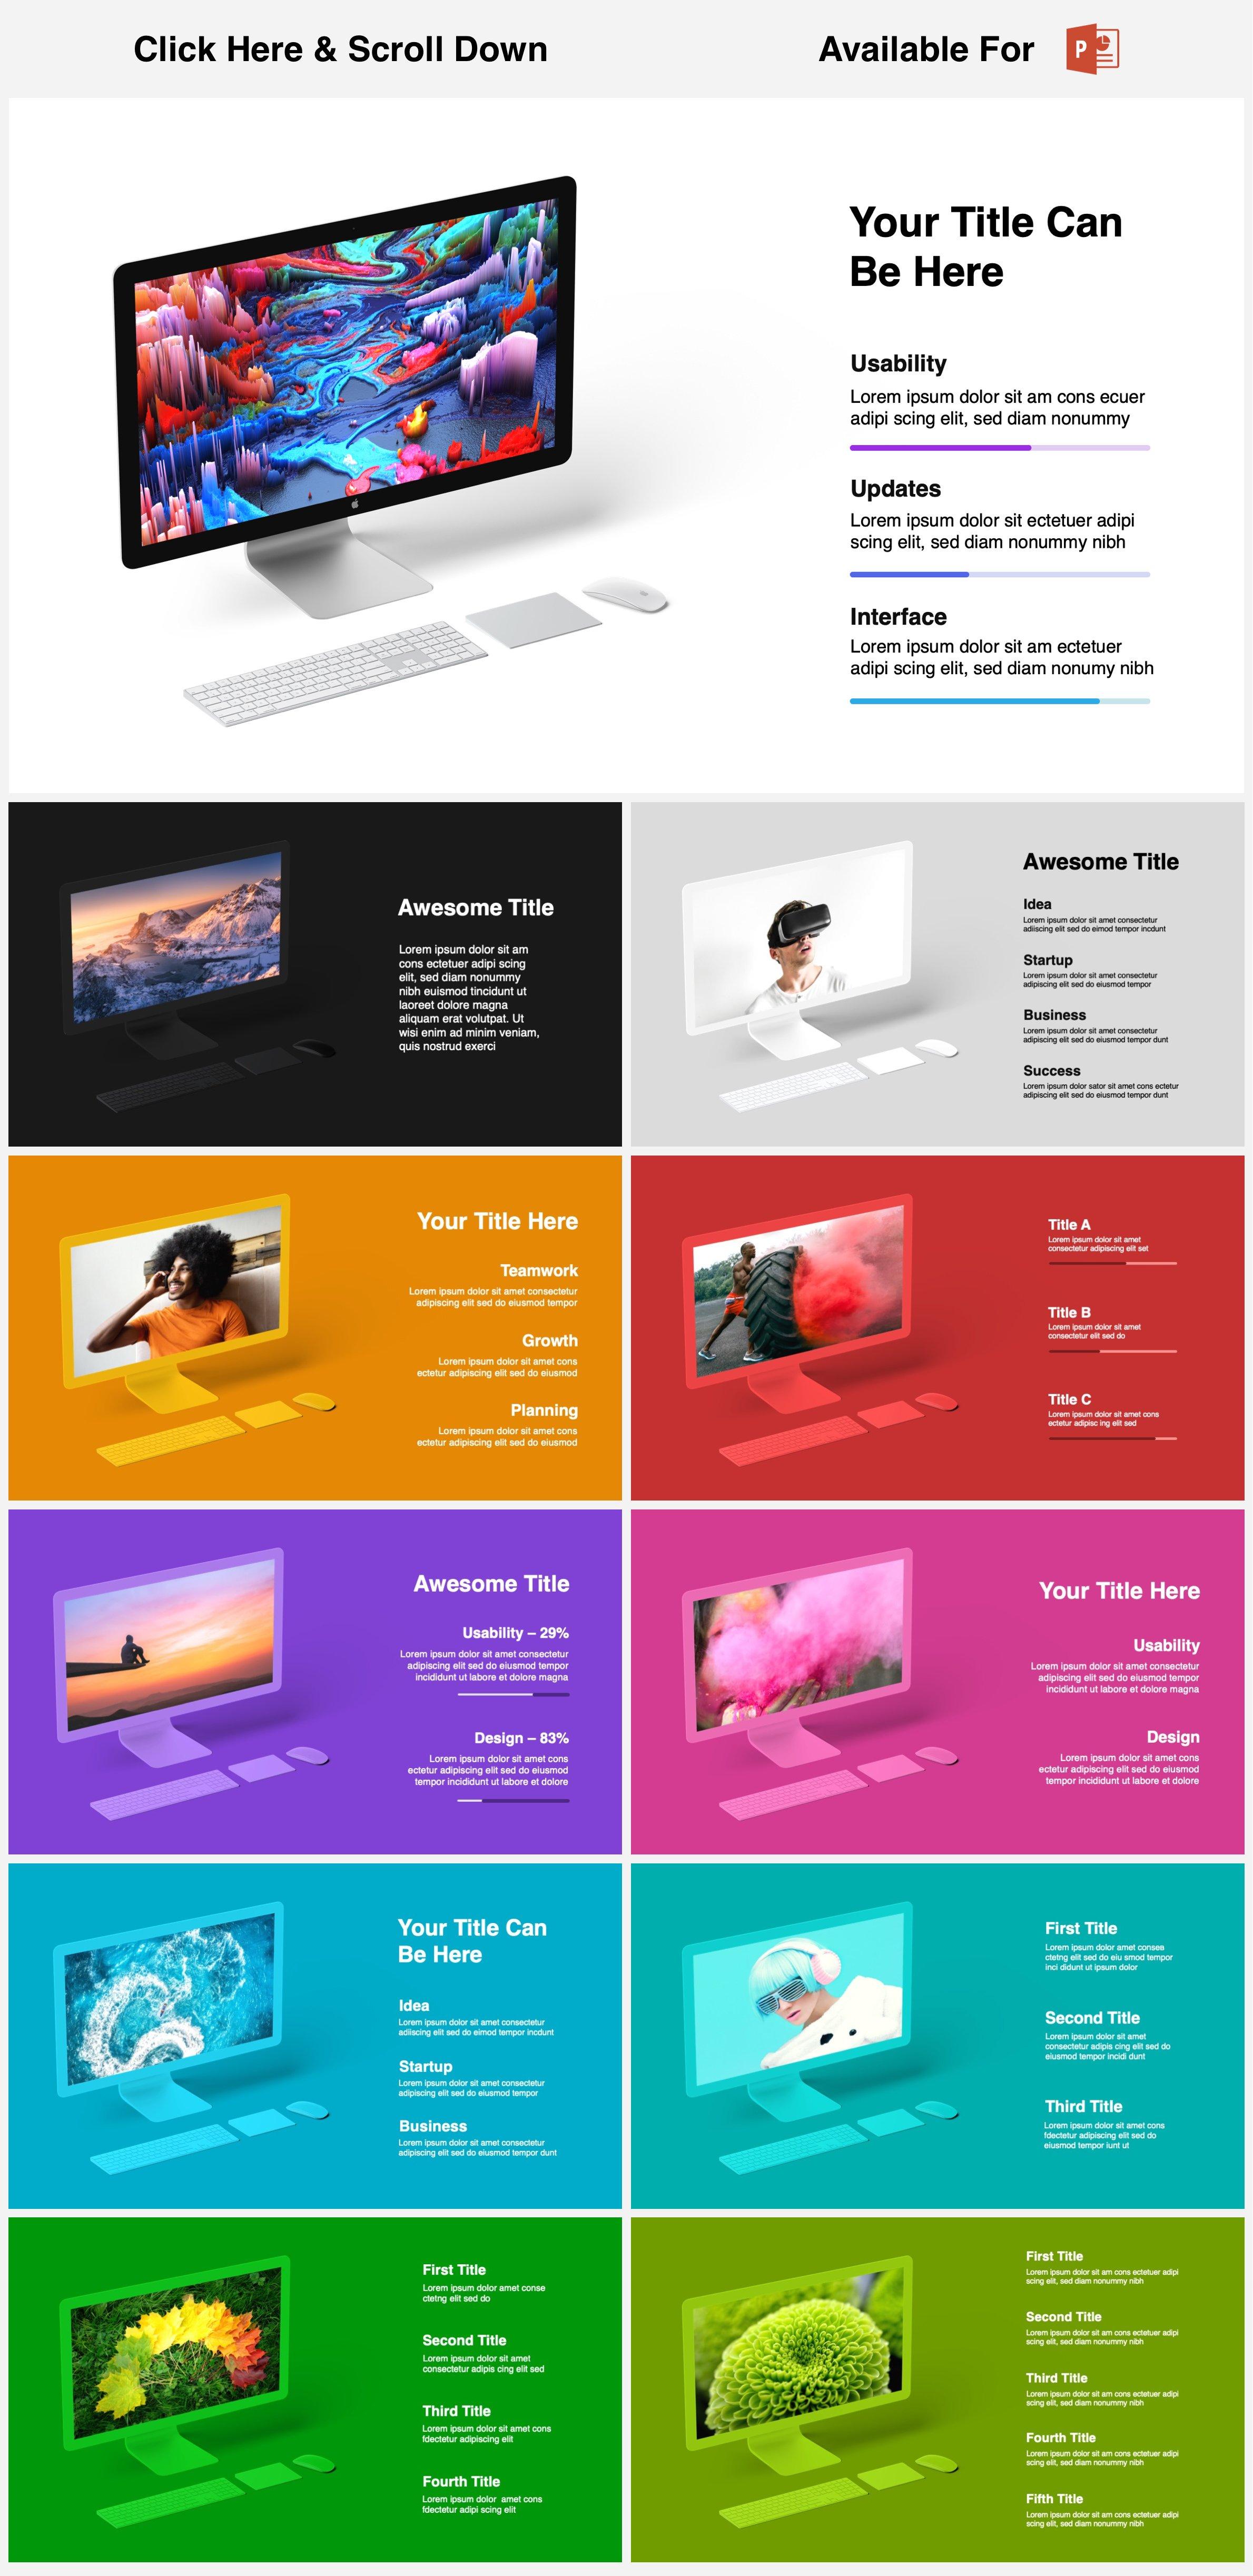 Animated Mockups Presentation Bundle. Infographic Templates. example image 8